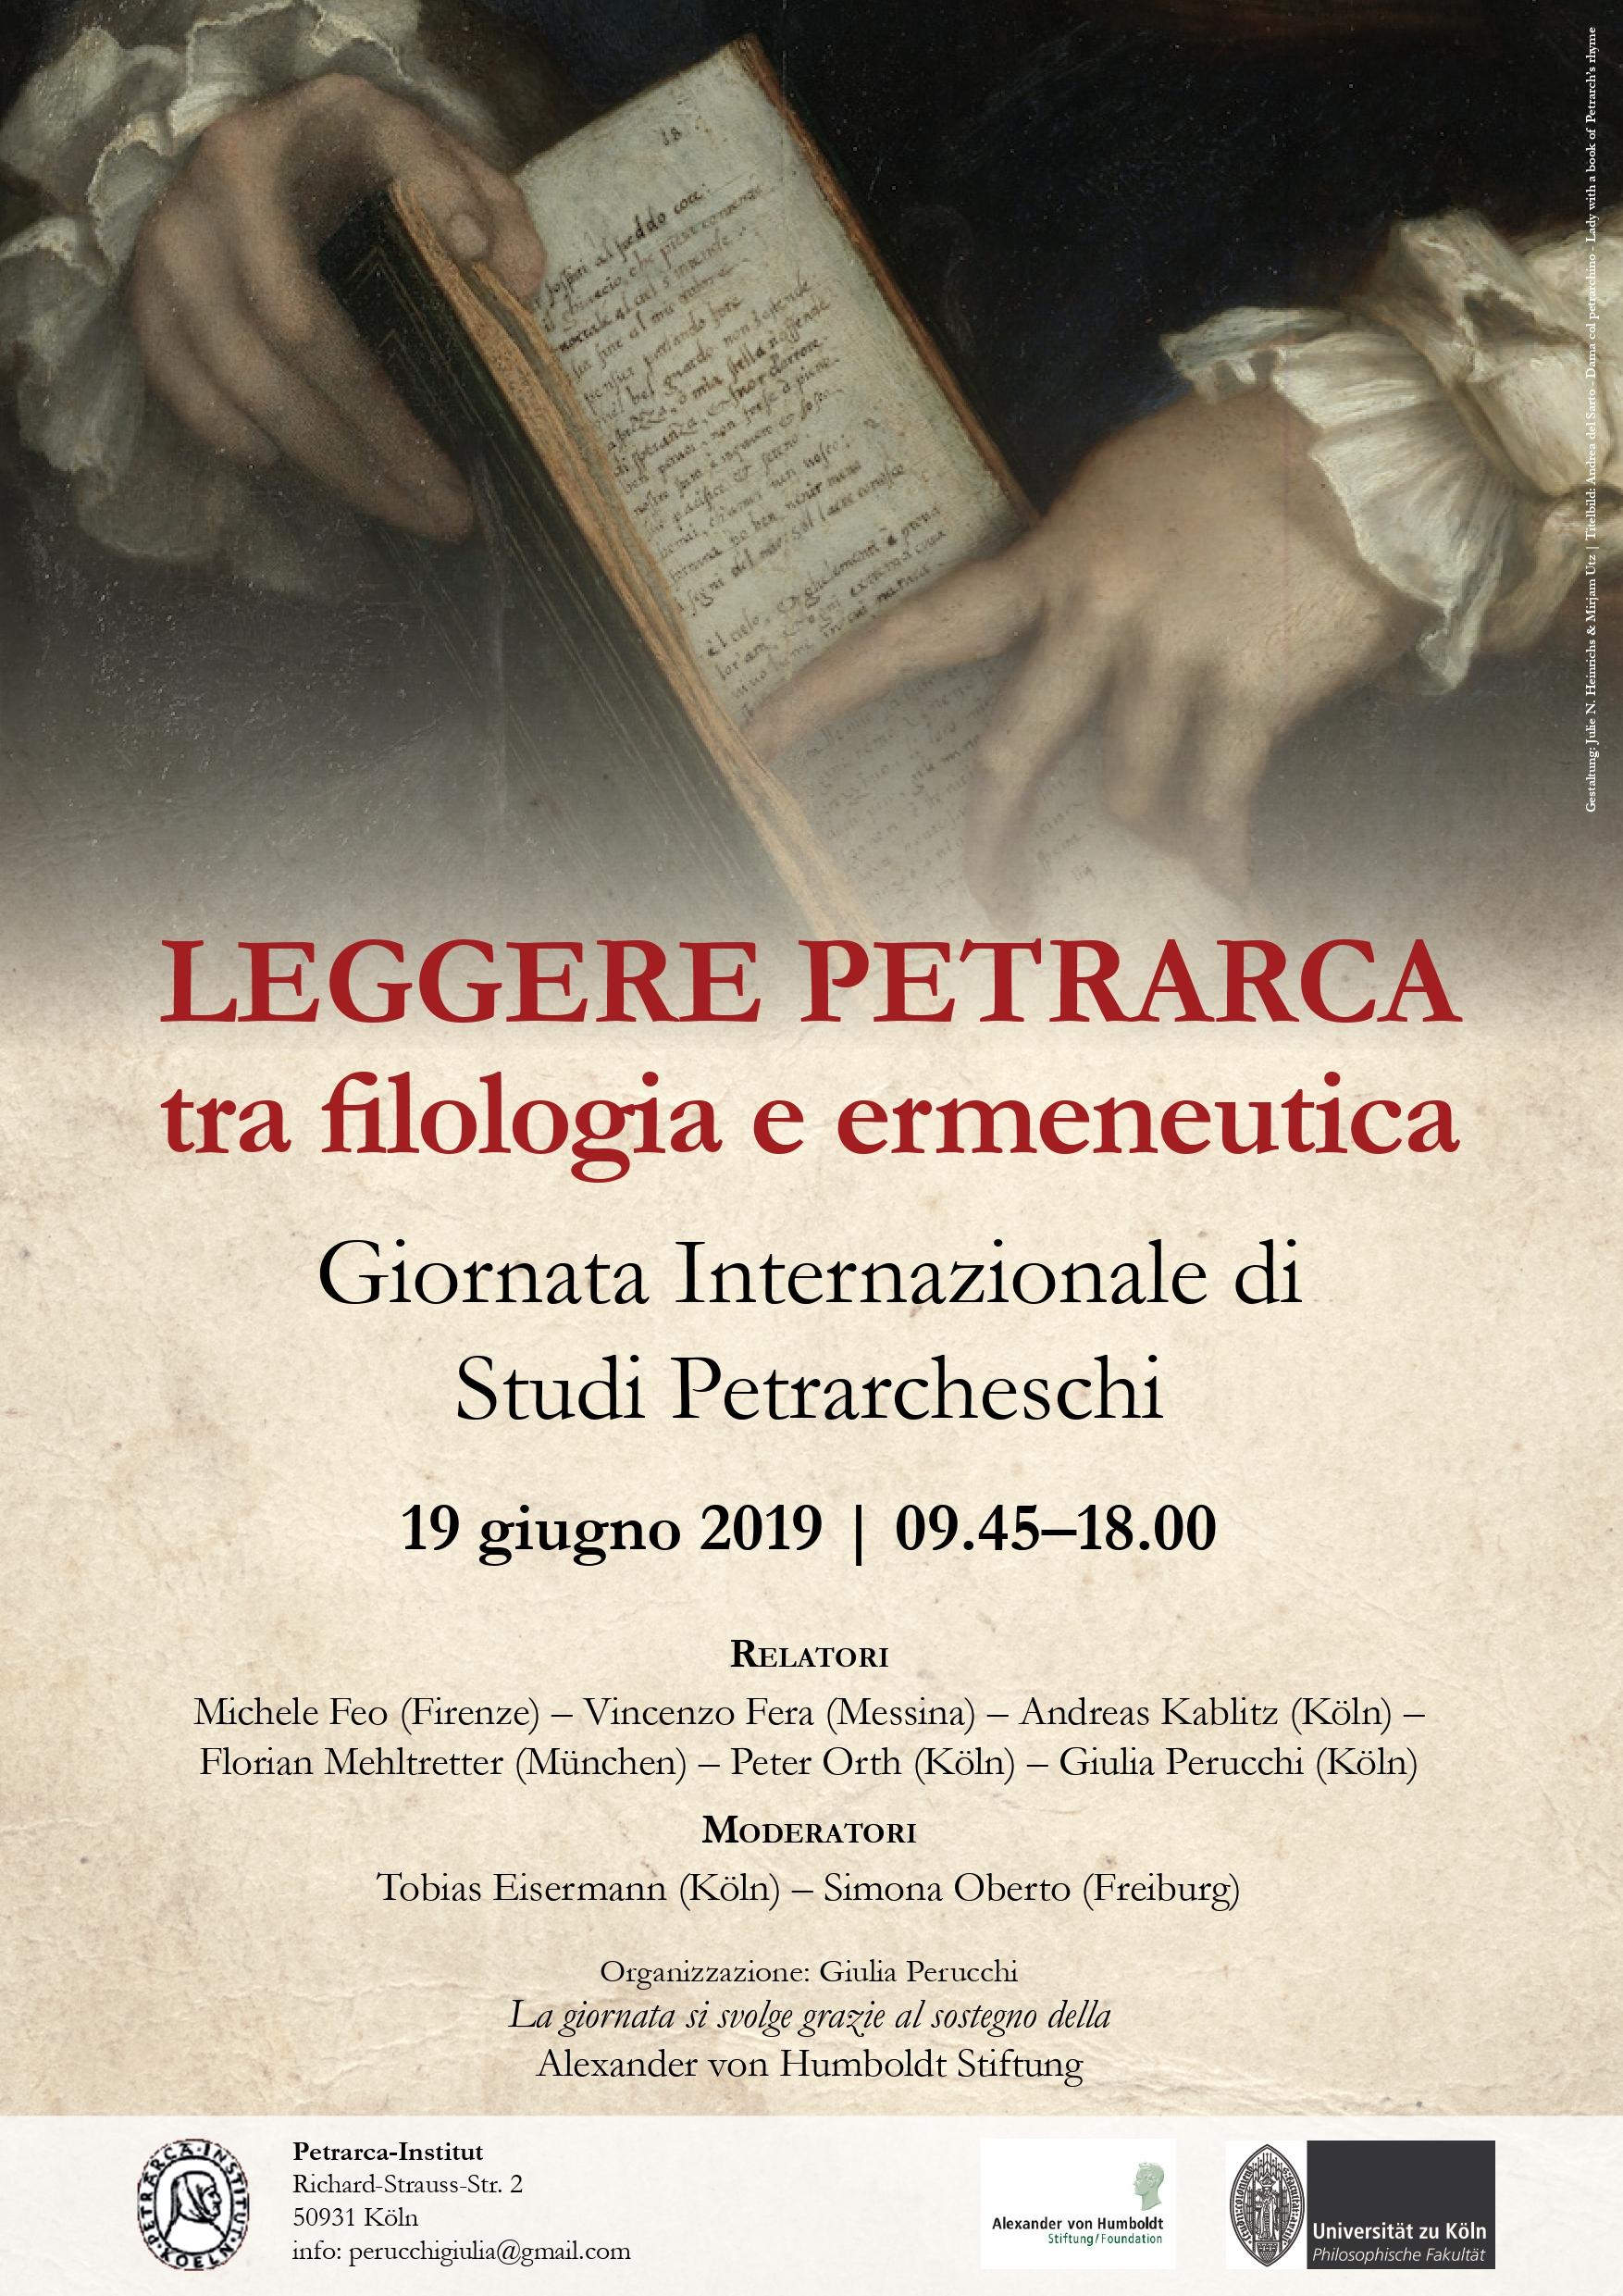 Leggere_Petrarca_DIN A3_Poster_web_page-0001